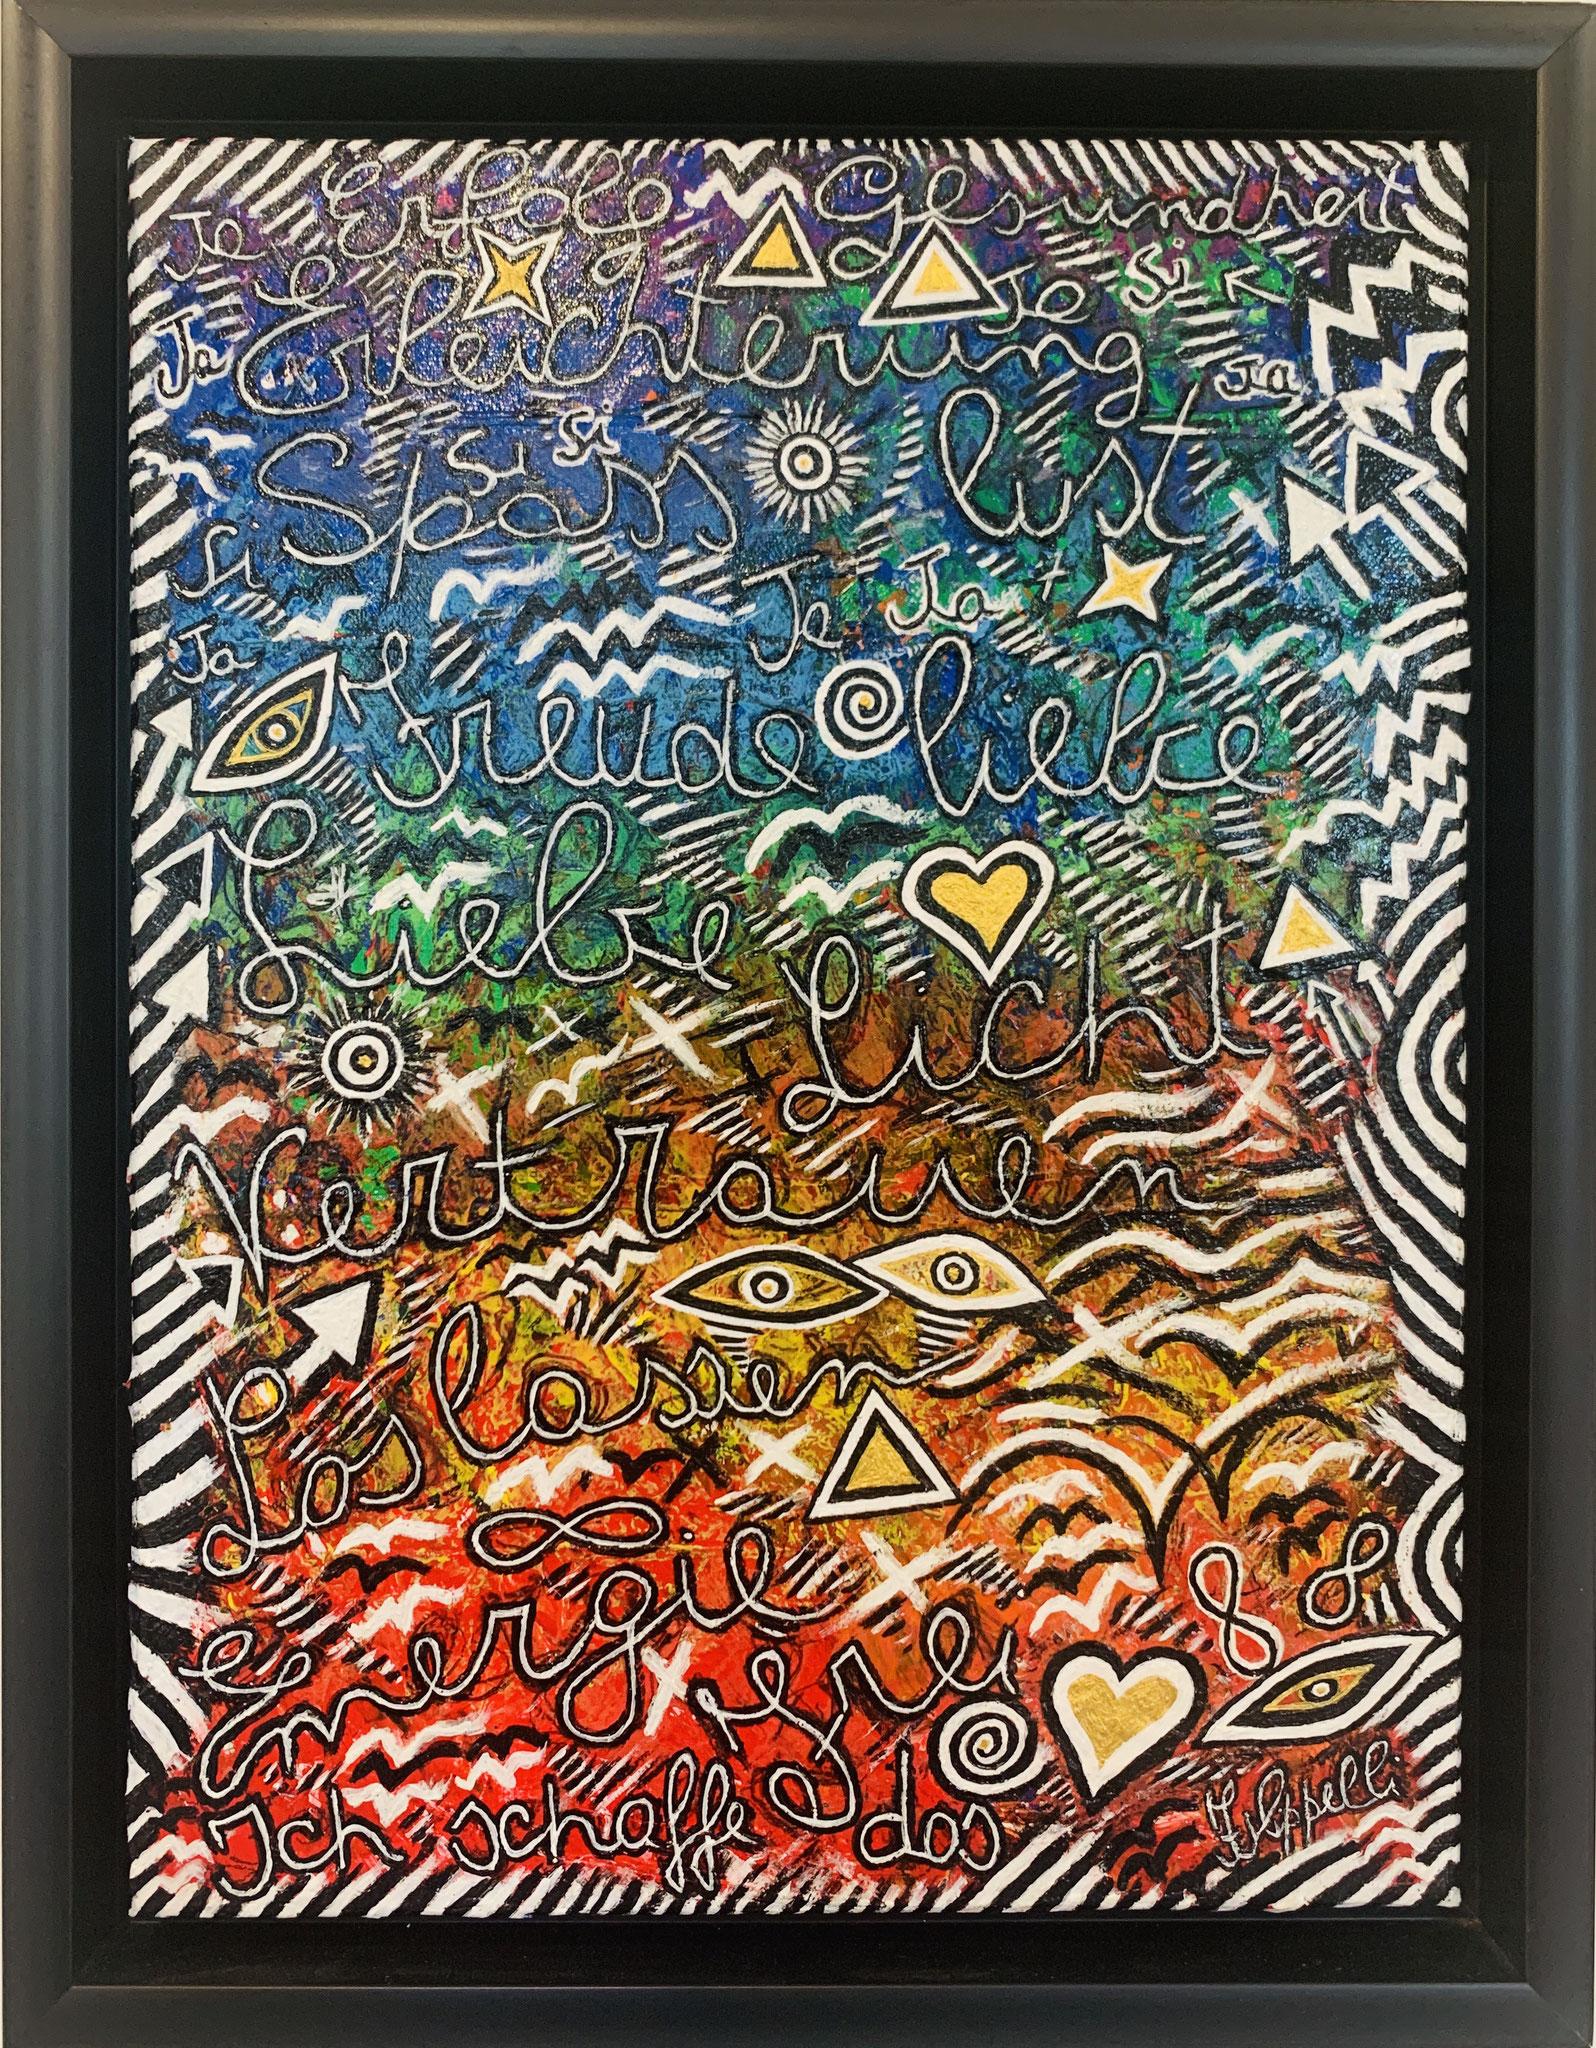 53. Ernesto Filipelli, ohne Titel, Acryl Pastell auf Leinwand, 350 x 450 mm, 320 € mit Rahmen